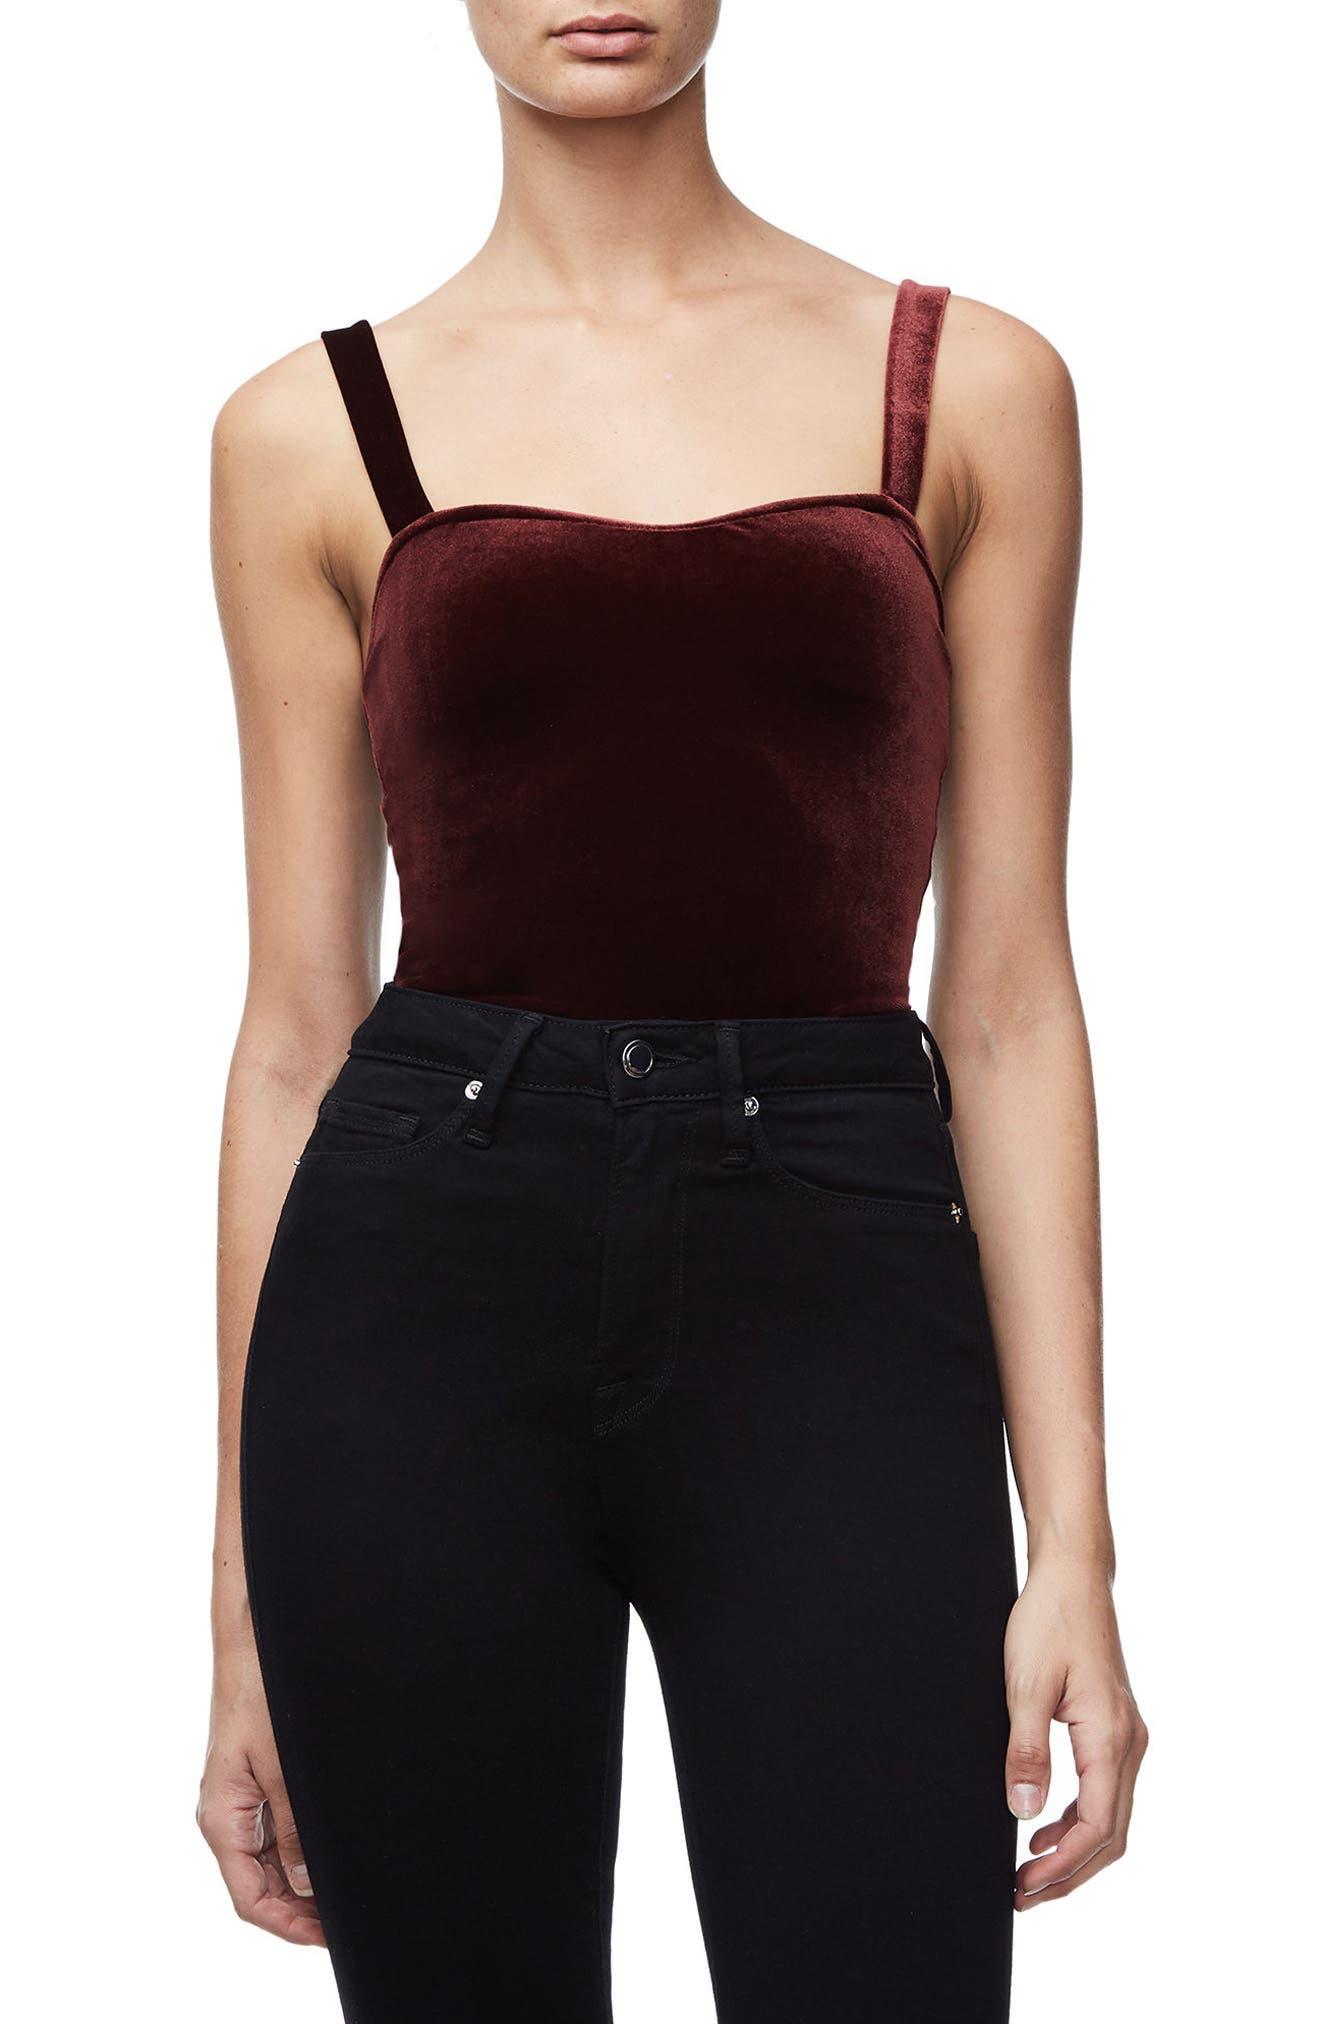 Main Image - Good American Sweetheart Bodysuit (Regular & Plus Size)